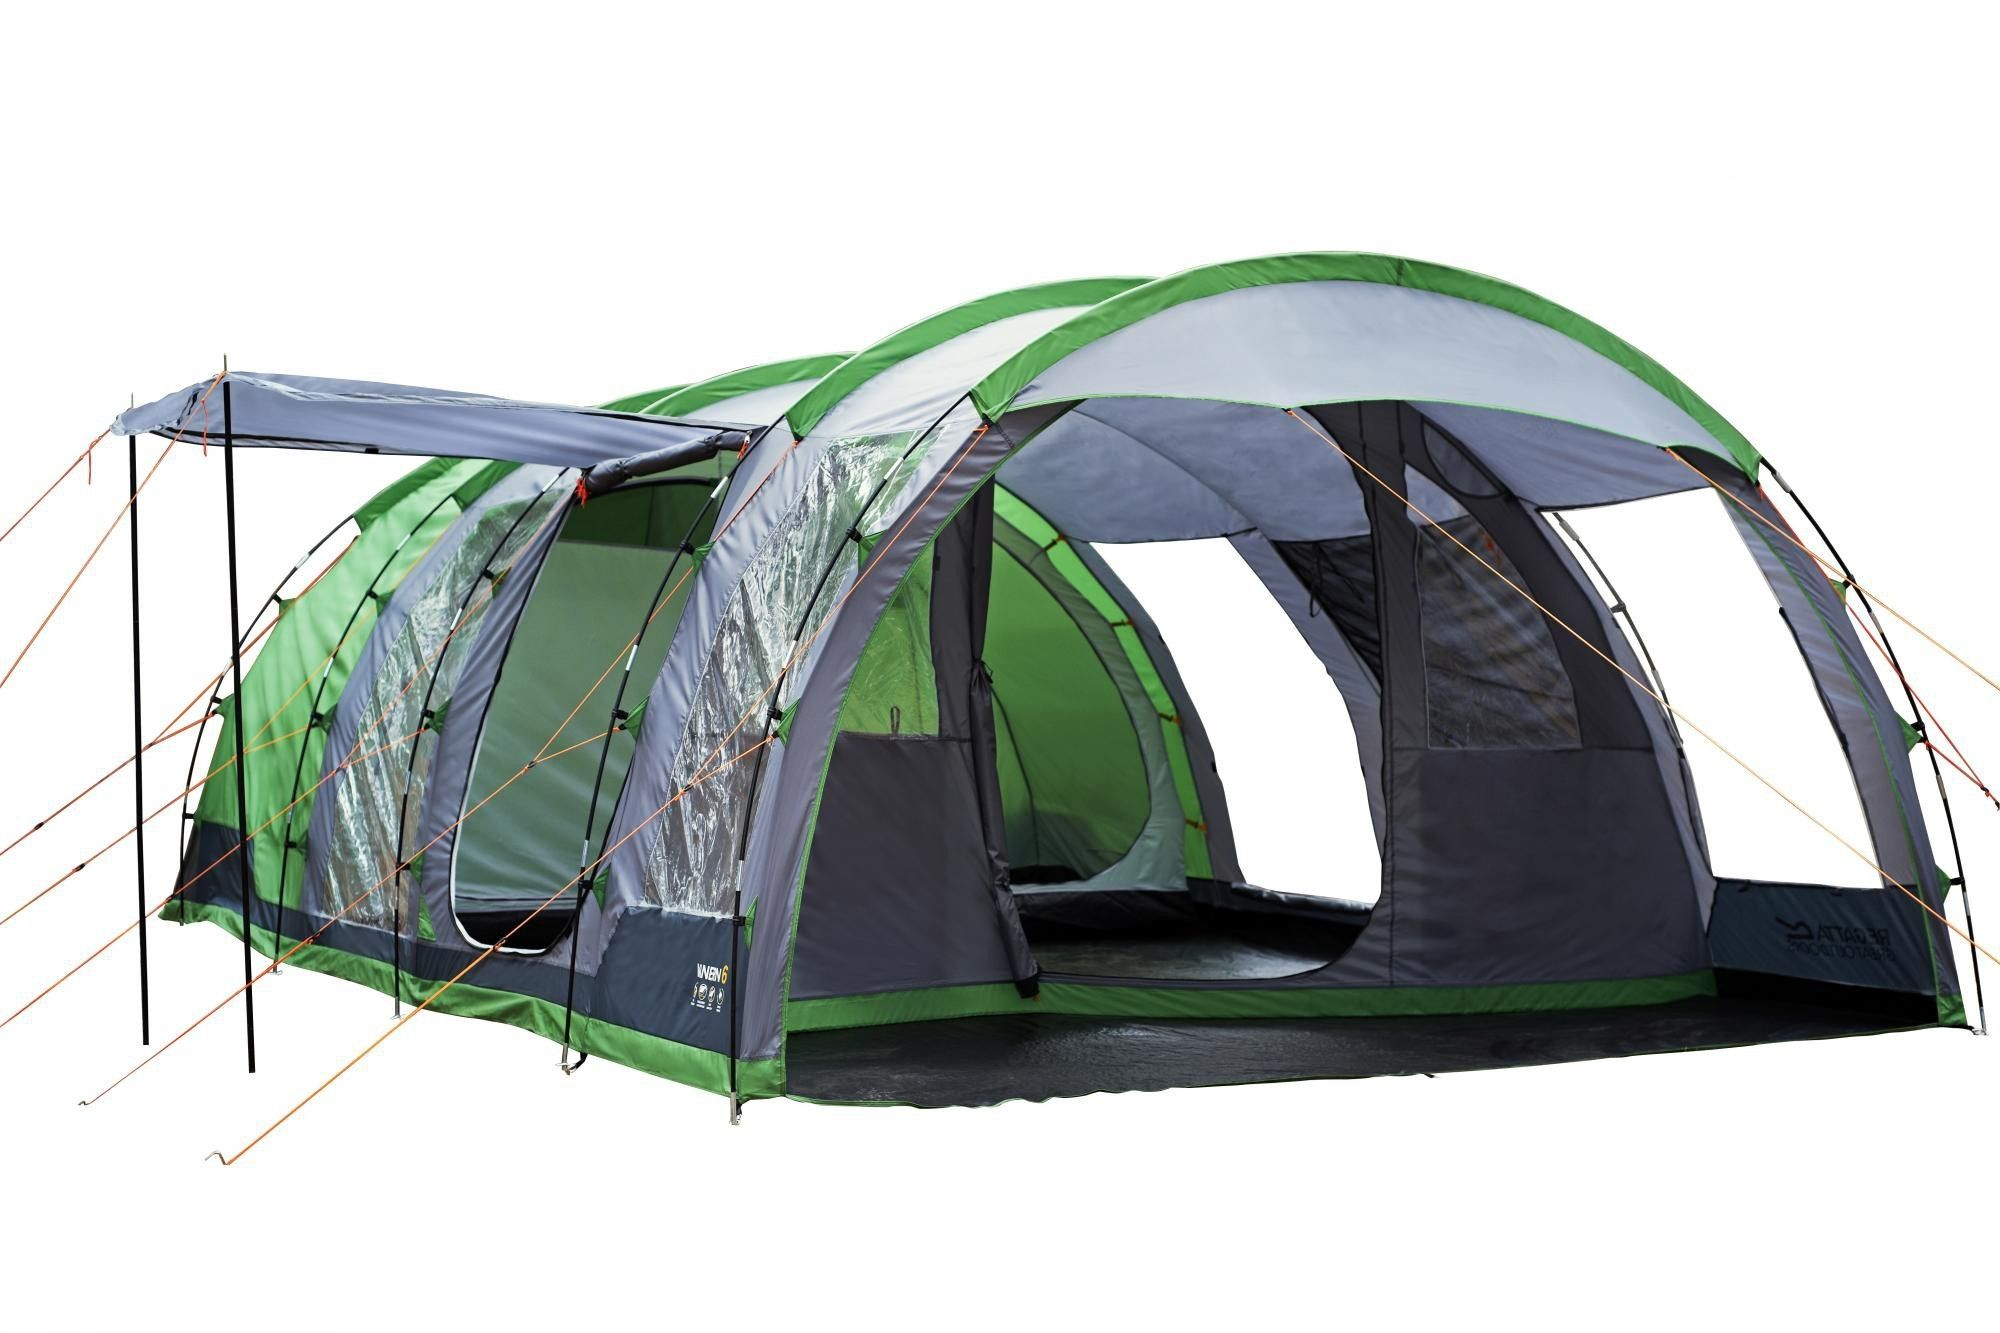 Regatta Tunnel Tent - 6 Man Vanern Family Tent - Green  sc 1 st  Pinterest & Regatta Tunnel Tent - 6 Man Vanern Family Tent - Green   Tents ...